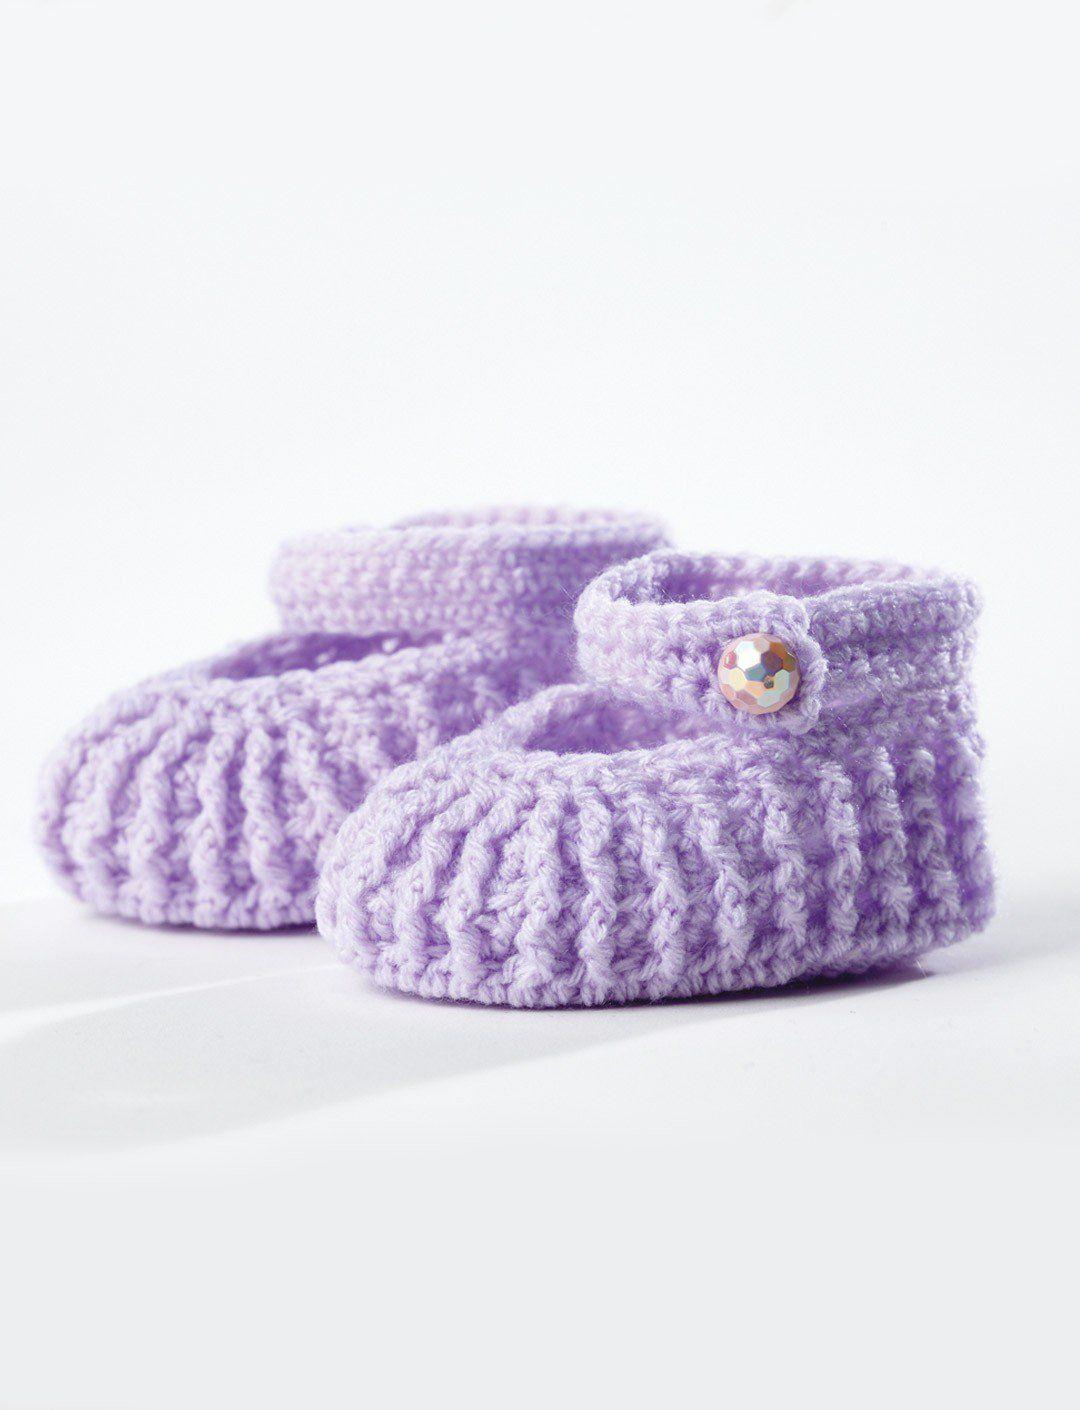 Crochet Baby Mary Jane Booties Free Patterns | Botines en croché ...